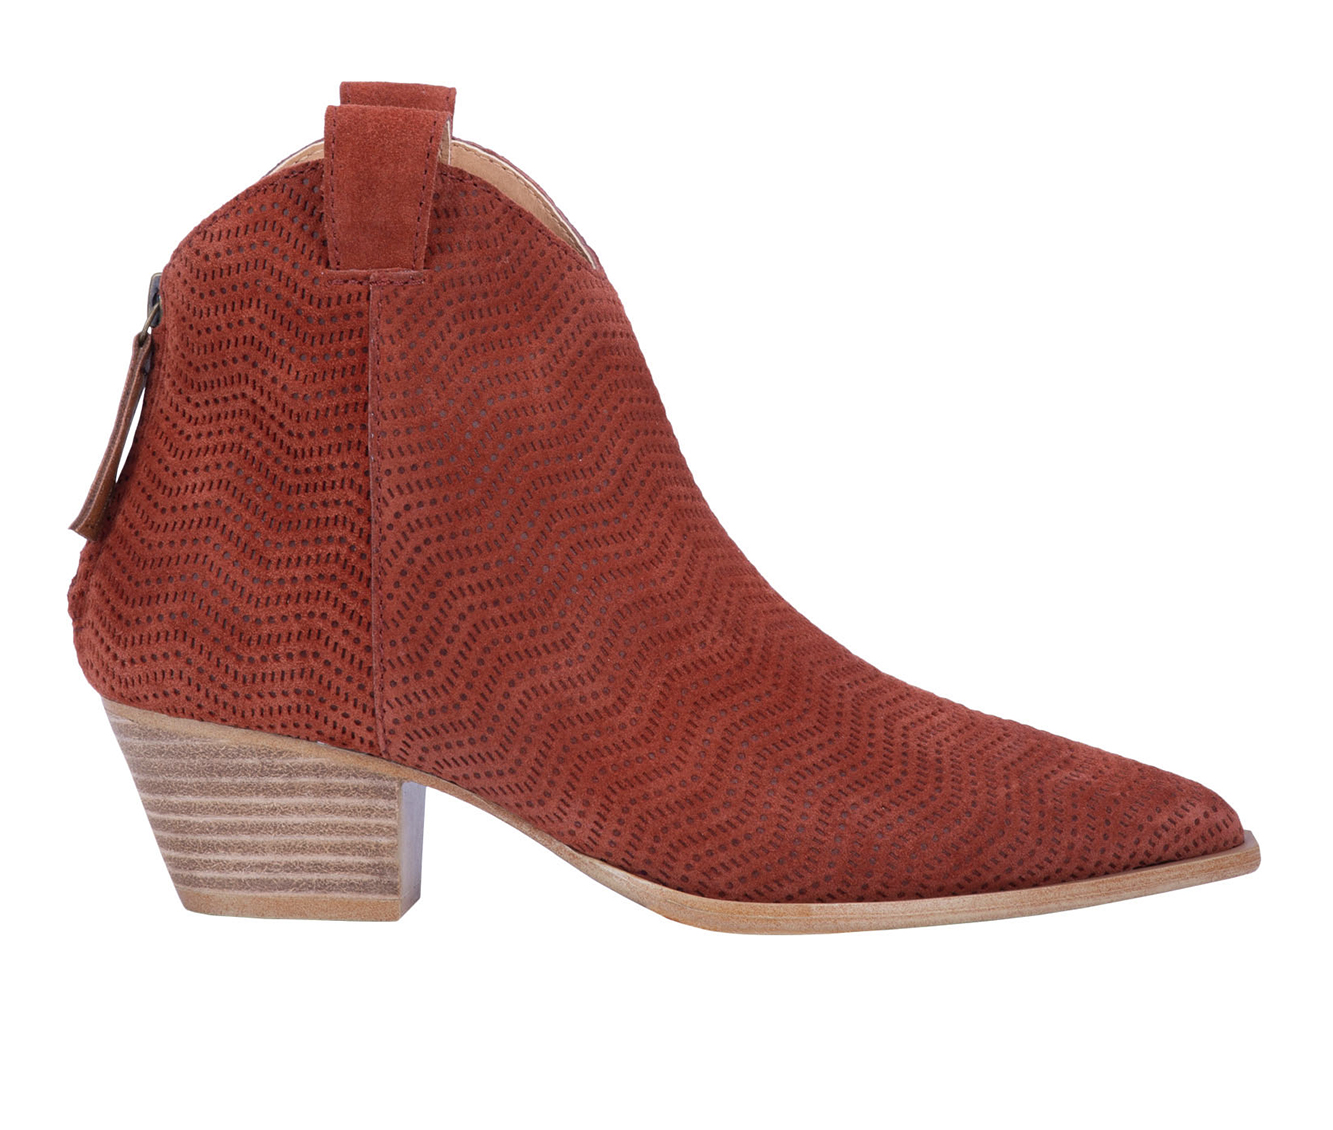 Dingo Boots Kuster Women's Boots (Orange - Leather)